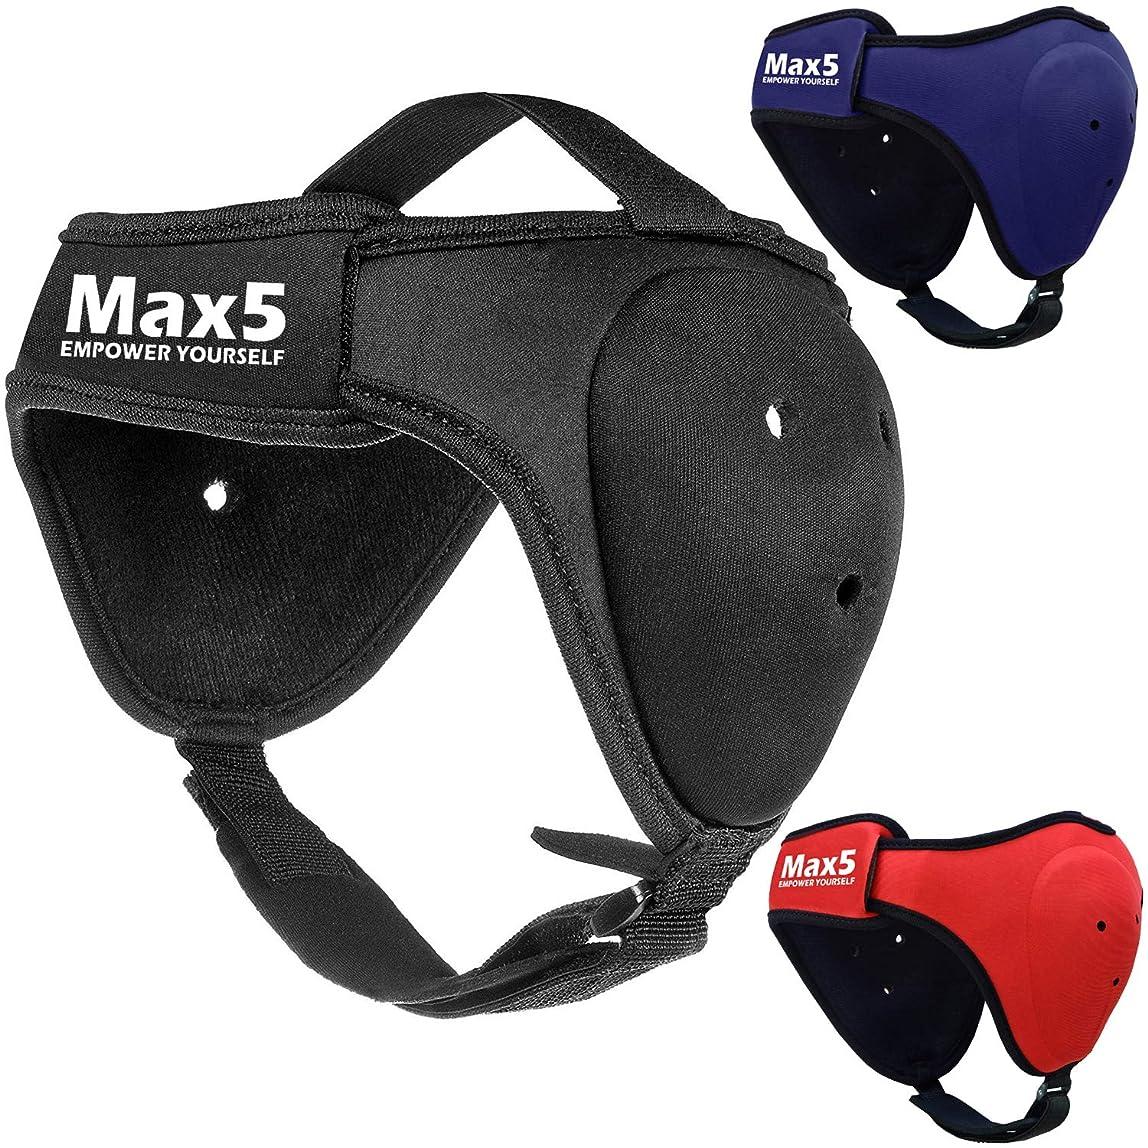 Max5 BJJ Headgear Wrestling Ear Guard MMA Cauliflower Ear Protection Fighting Sparring Helmet adlzict786291